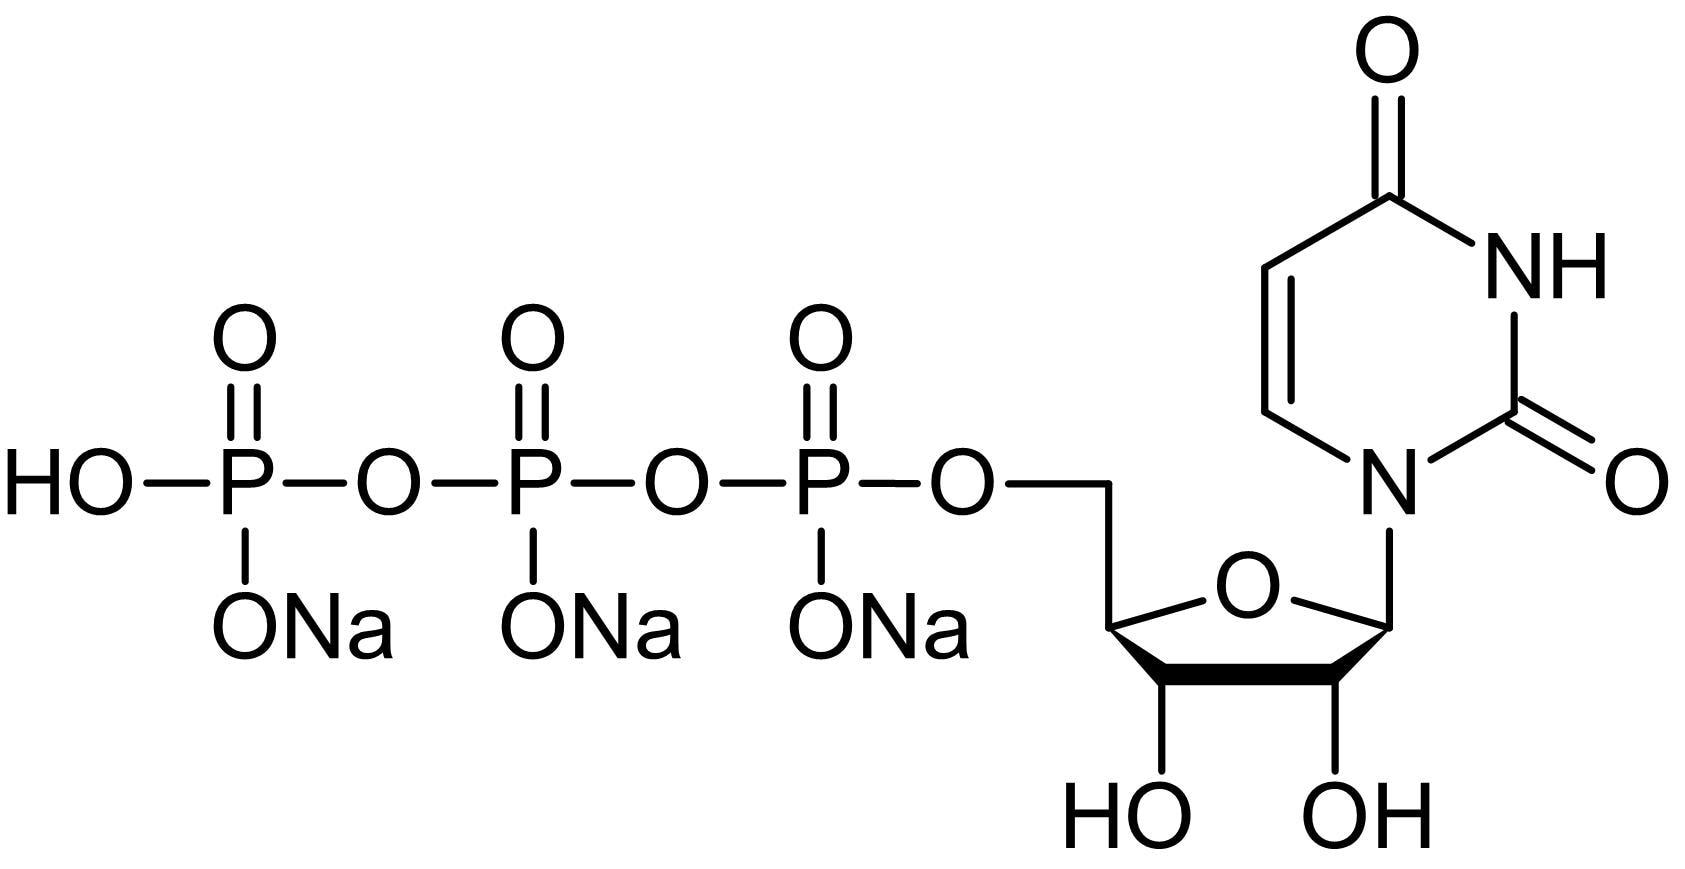 Chemical Structure - Uridine-5'-triphosphate [UTP] trisodium salt, P2Y receptor agonist (ab146222)